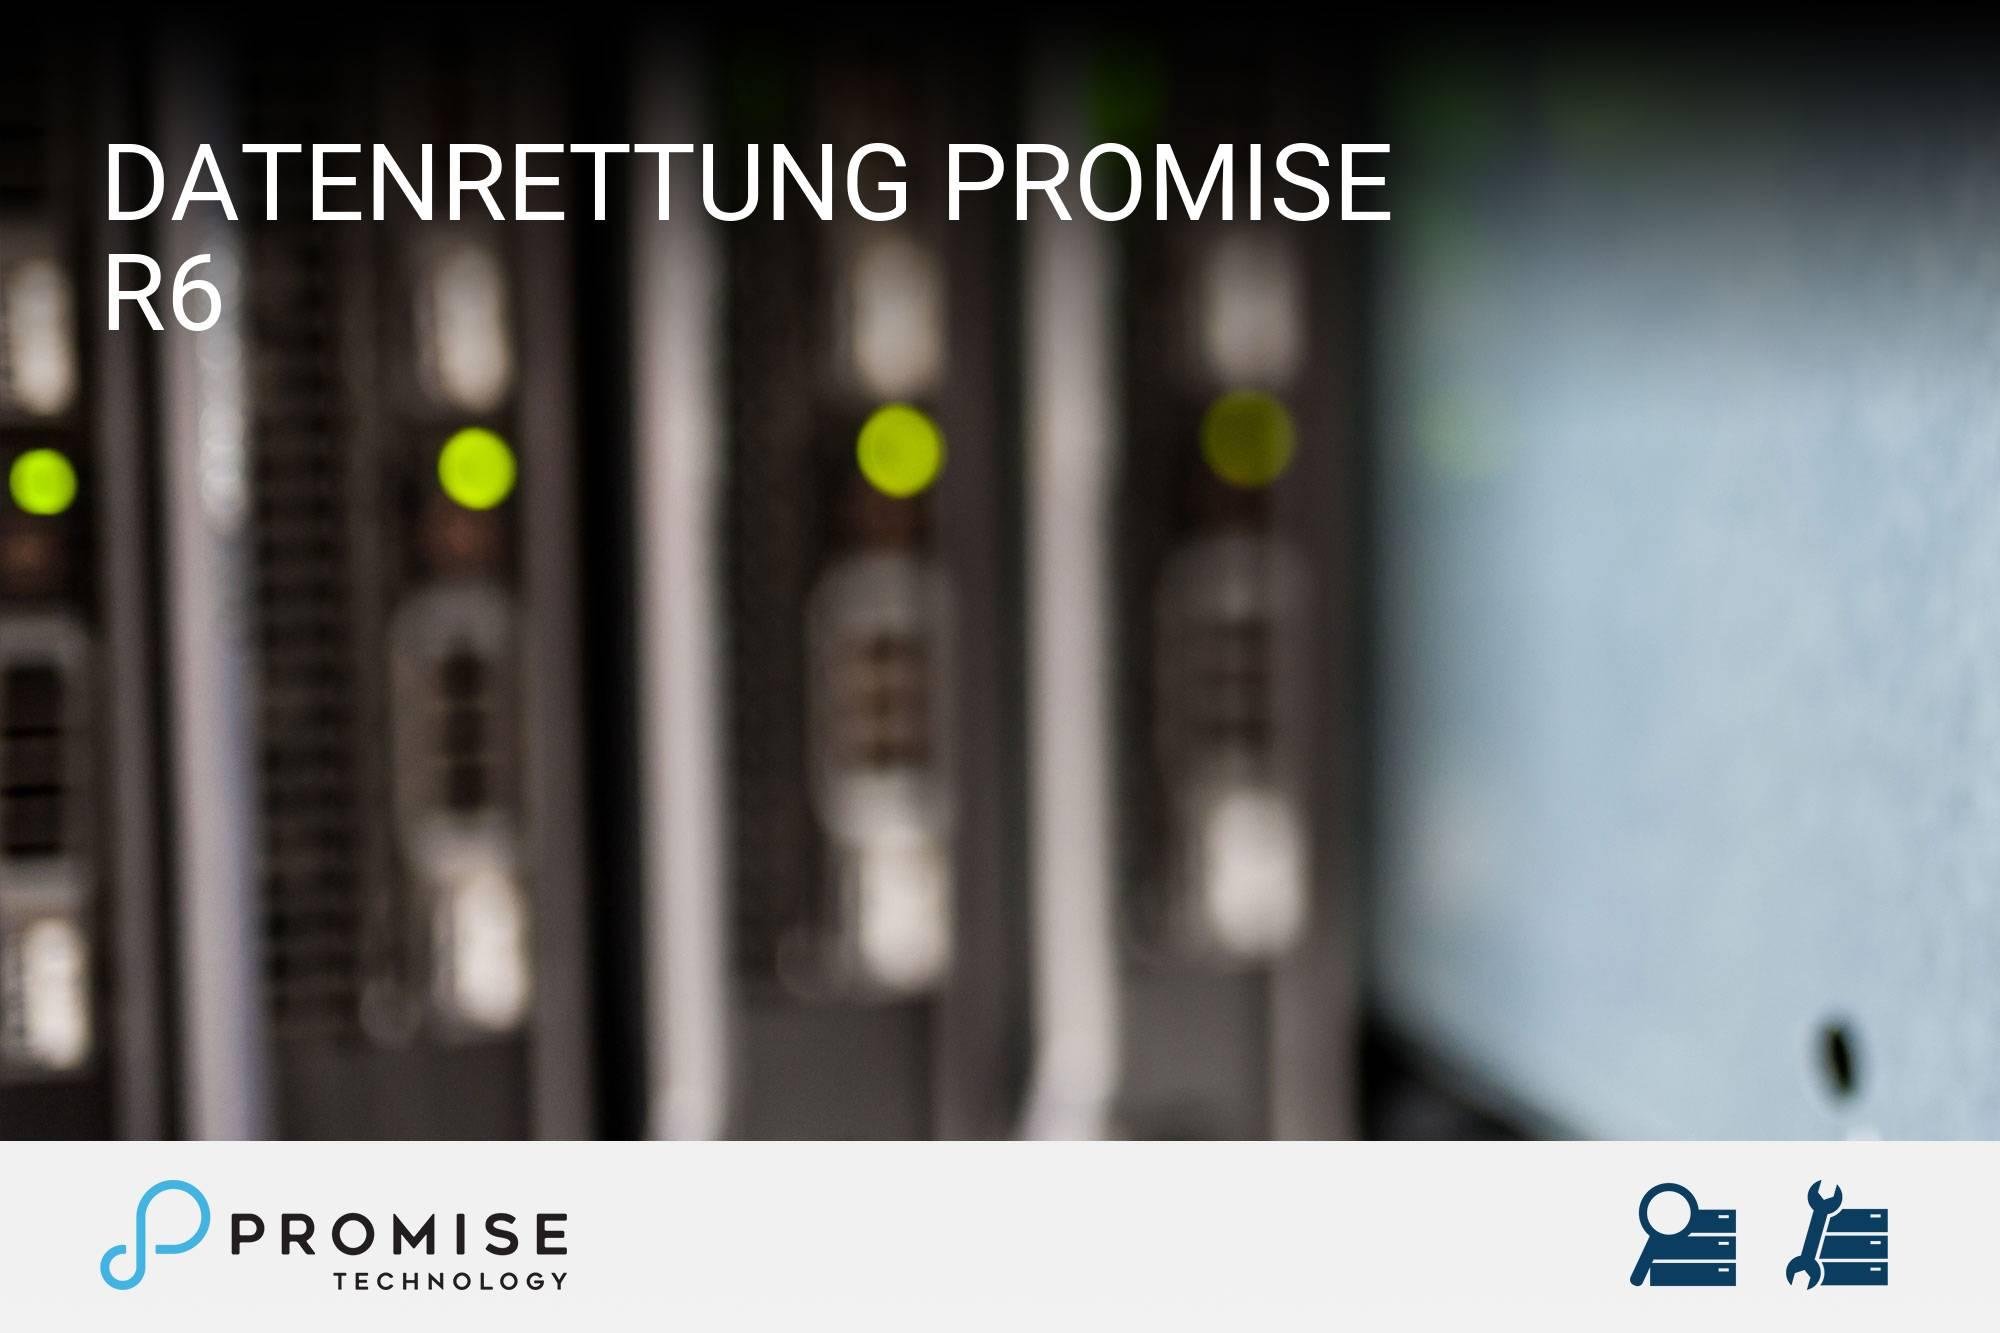 Promise R6